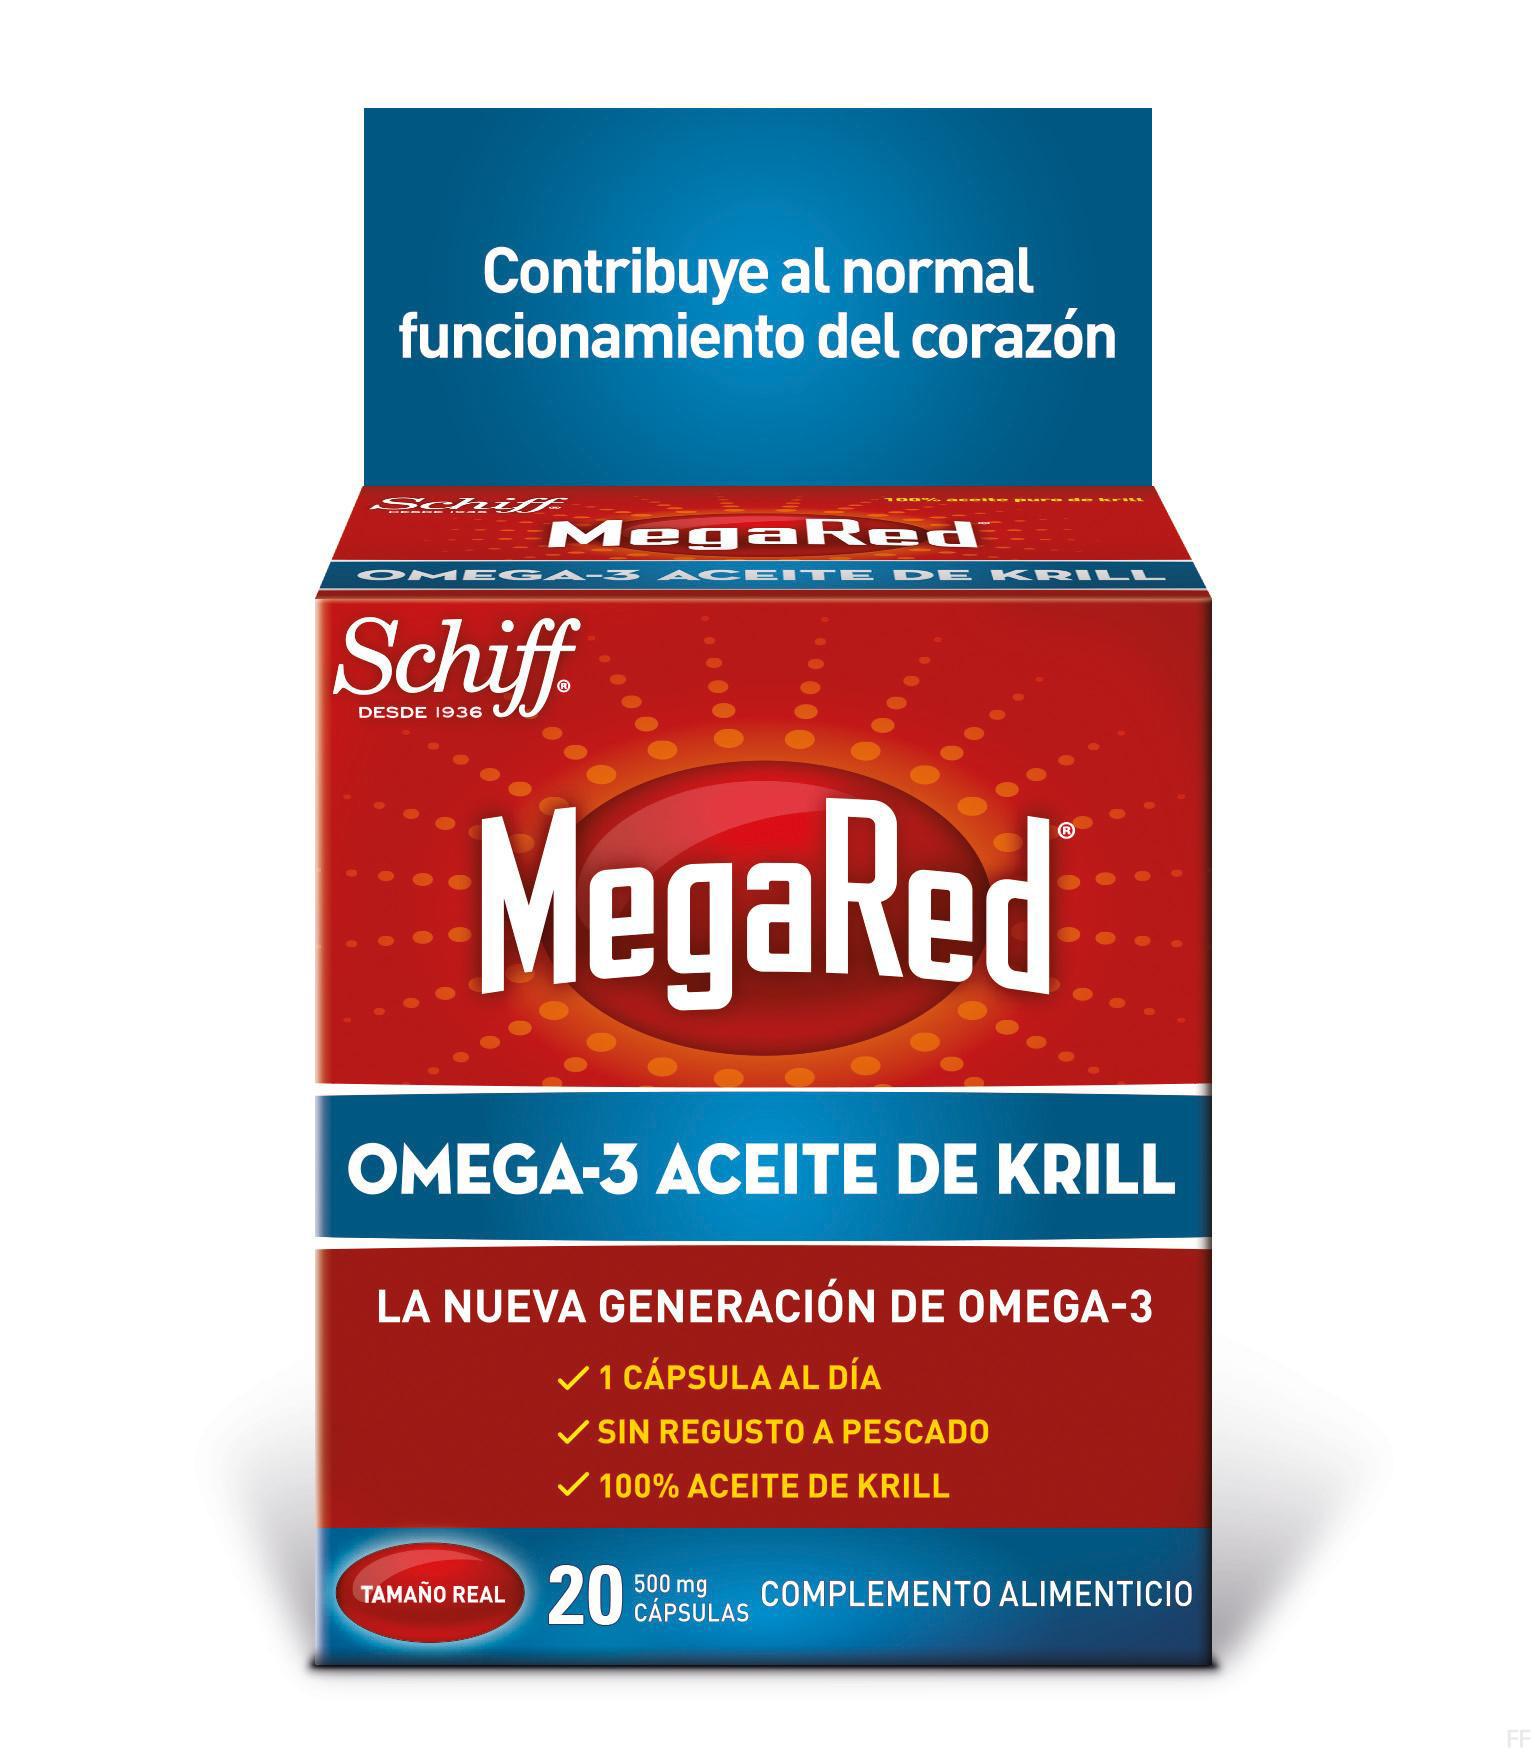 MegaRed Omega-3 Aceite de Krill